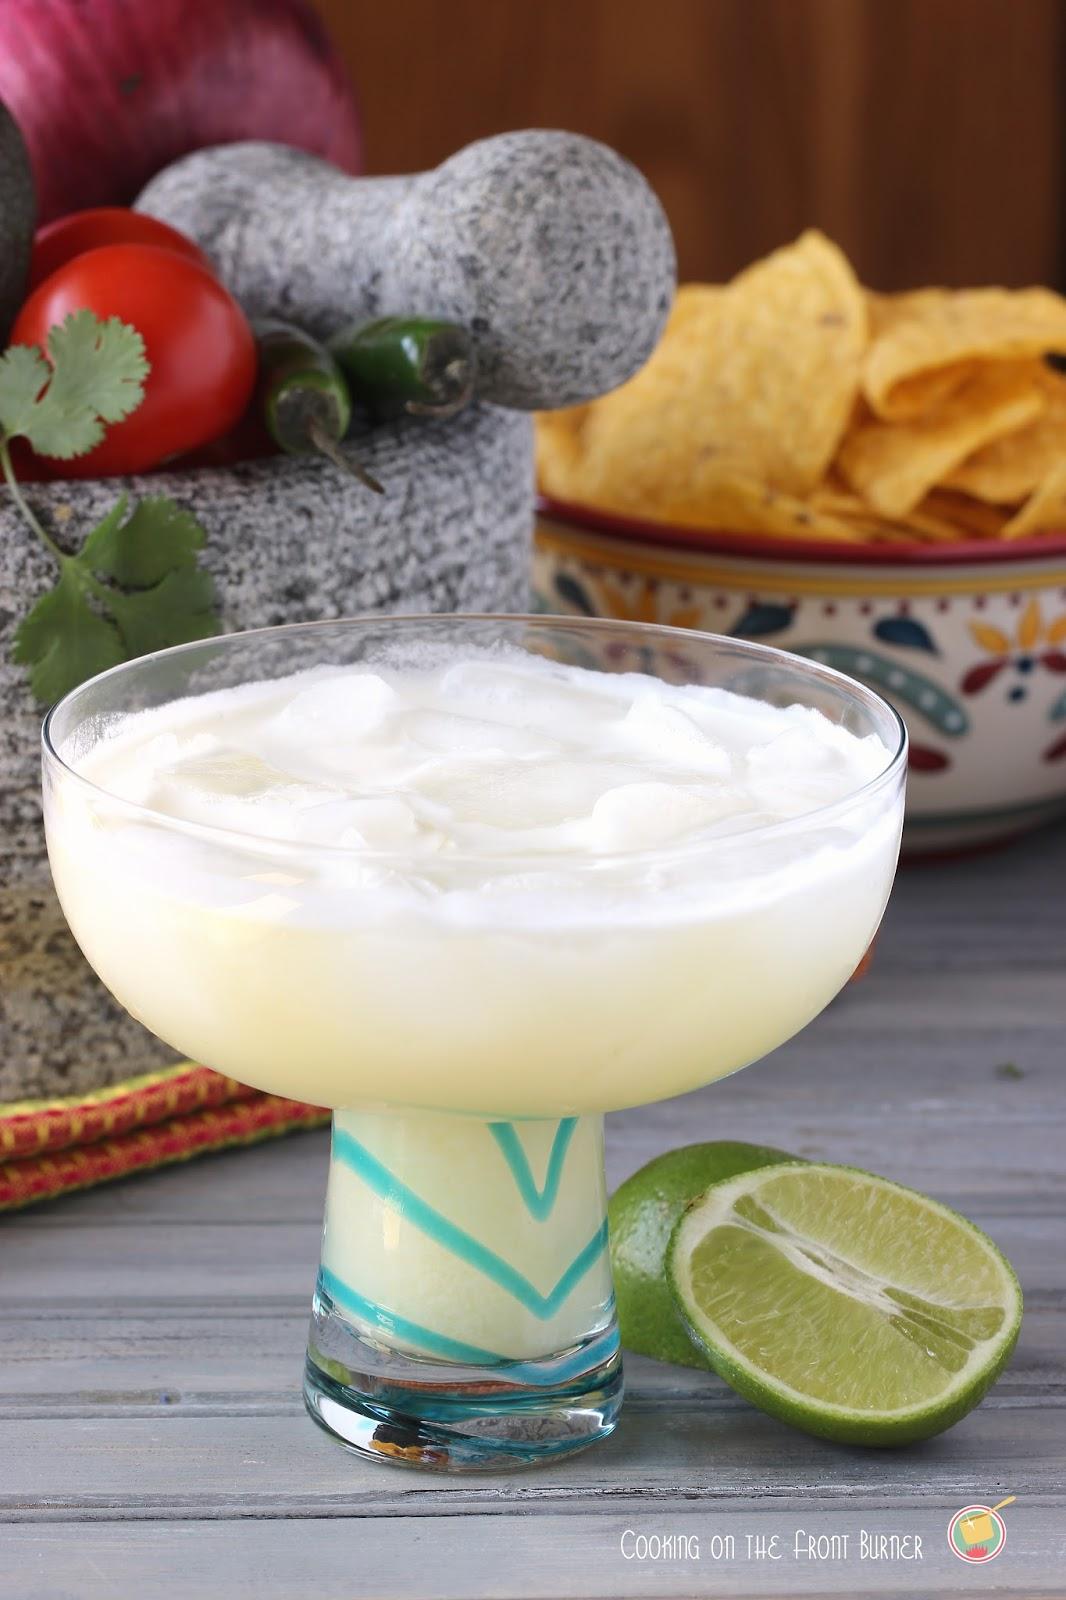 Colada Margarita - a twist combining a pina colada and margarita | Cooking on the Front Burner #cincodemayo #cocktails #margarita #pinacolada